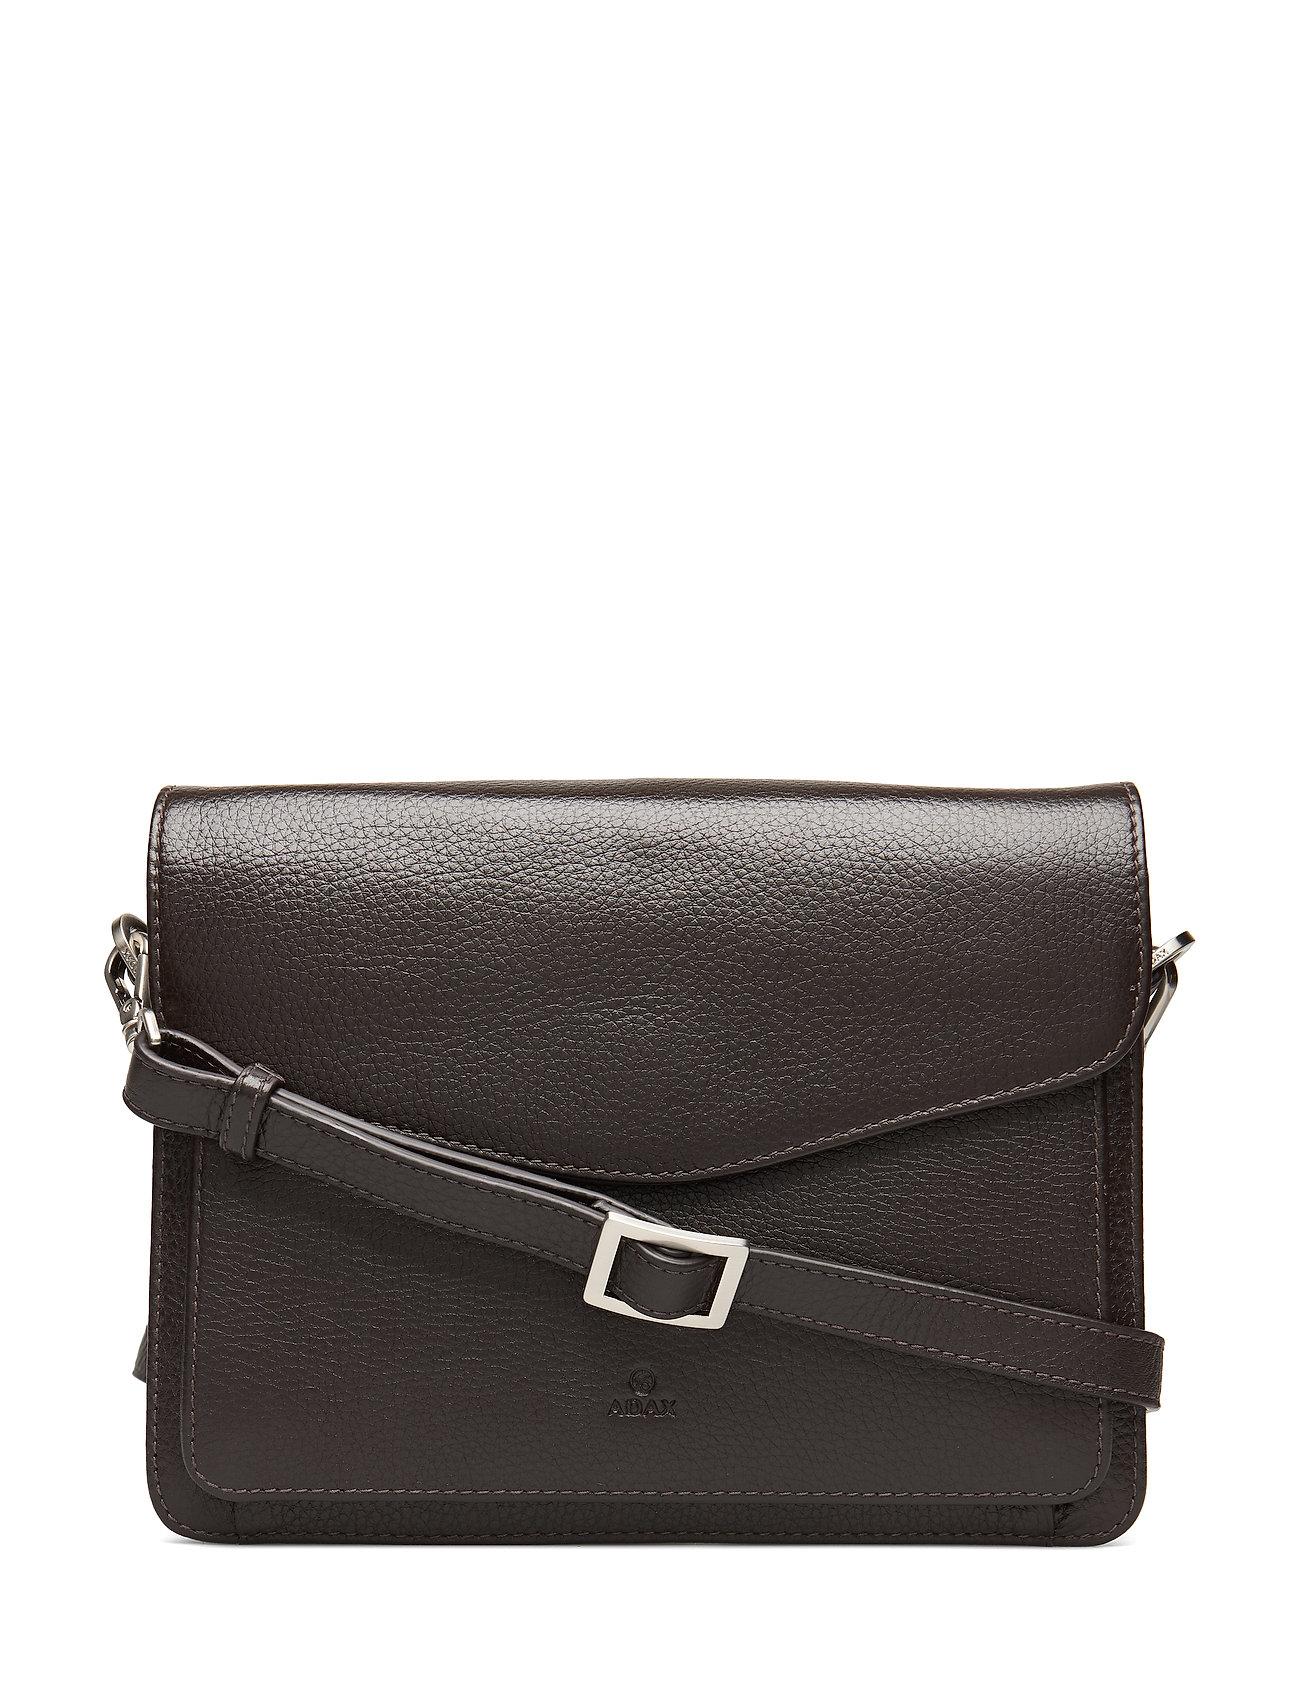 Cormorano Shoulder Bag Lilja Bags Small Shoulder Bags - Crossbody Bags Musta Adax